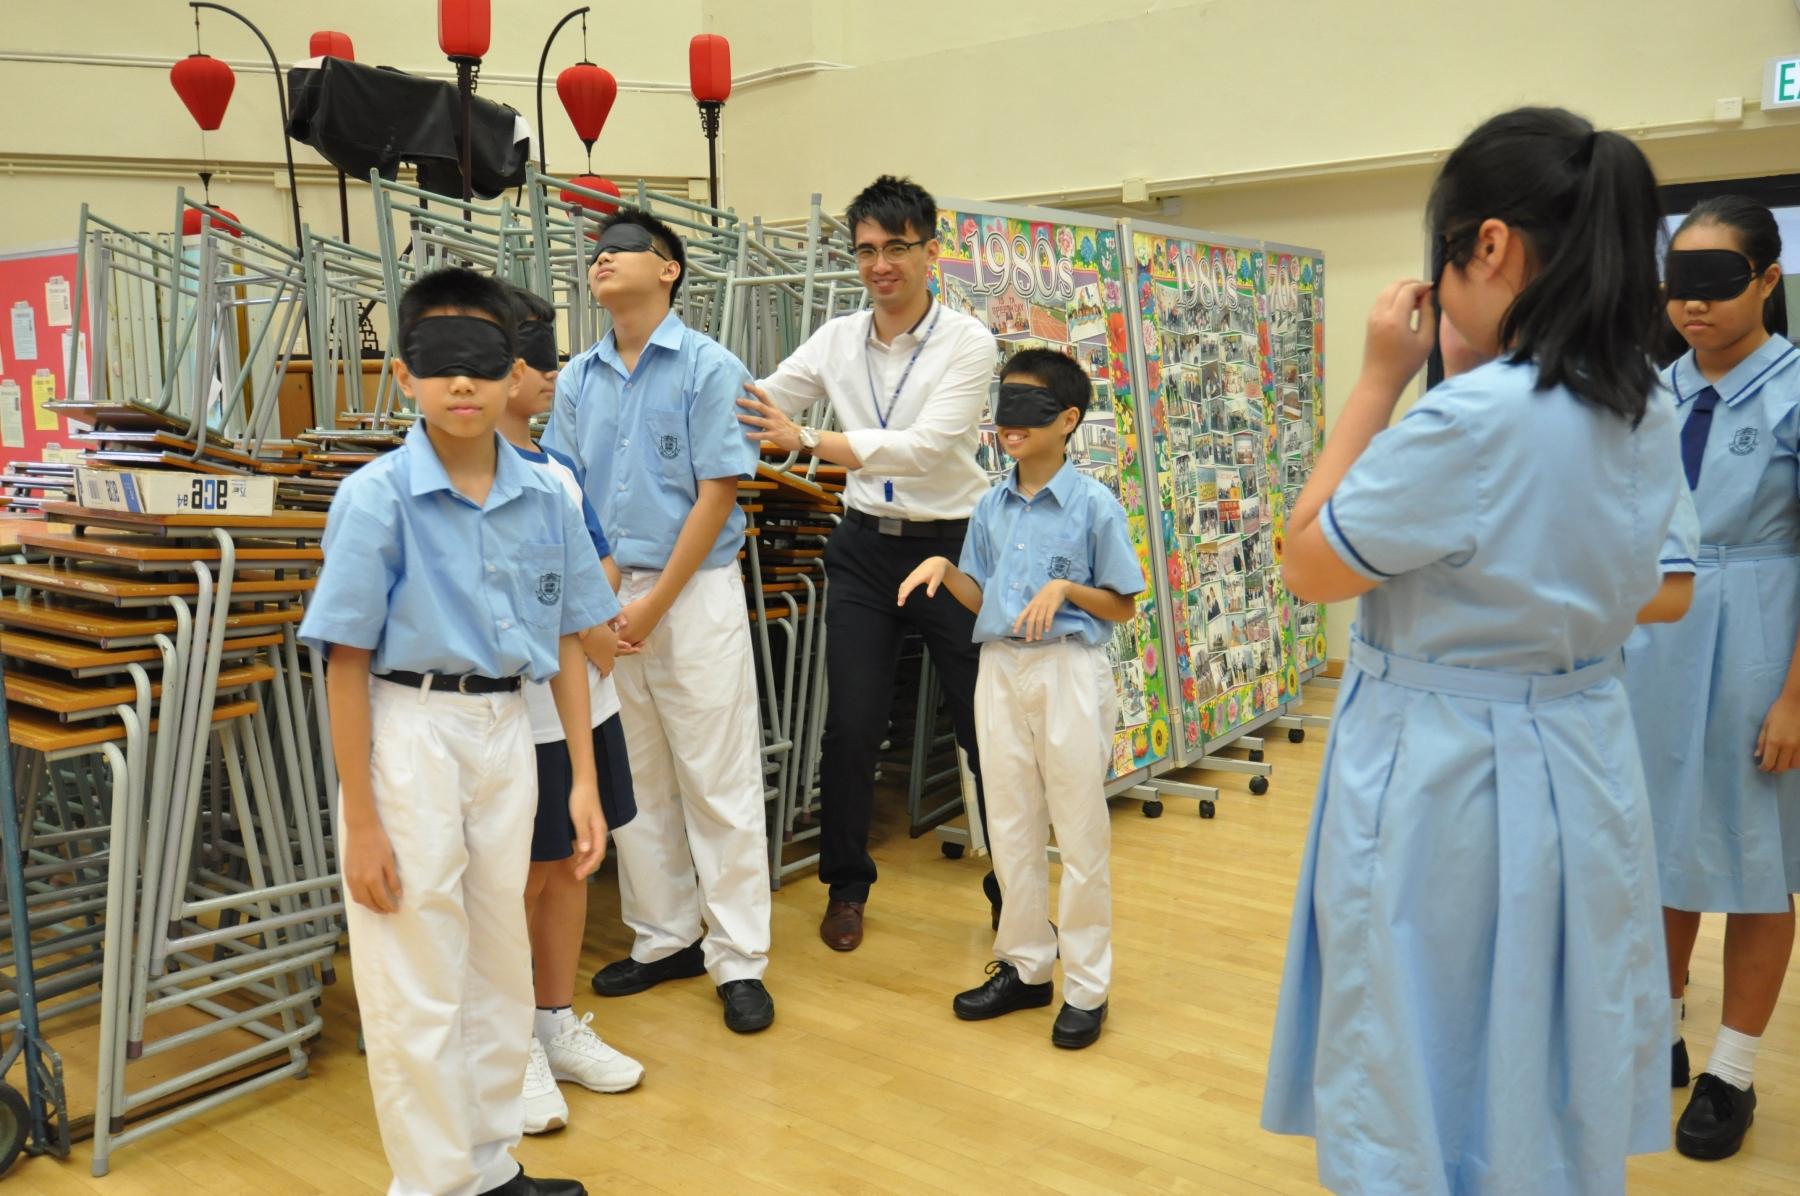 http://www.npc.edu.hk/sites/default/files/dsc_0199.jpg